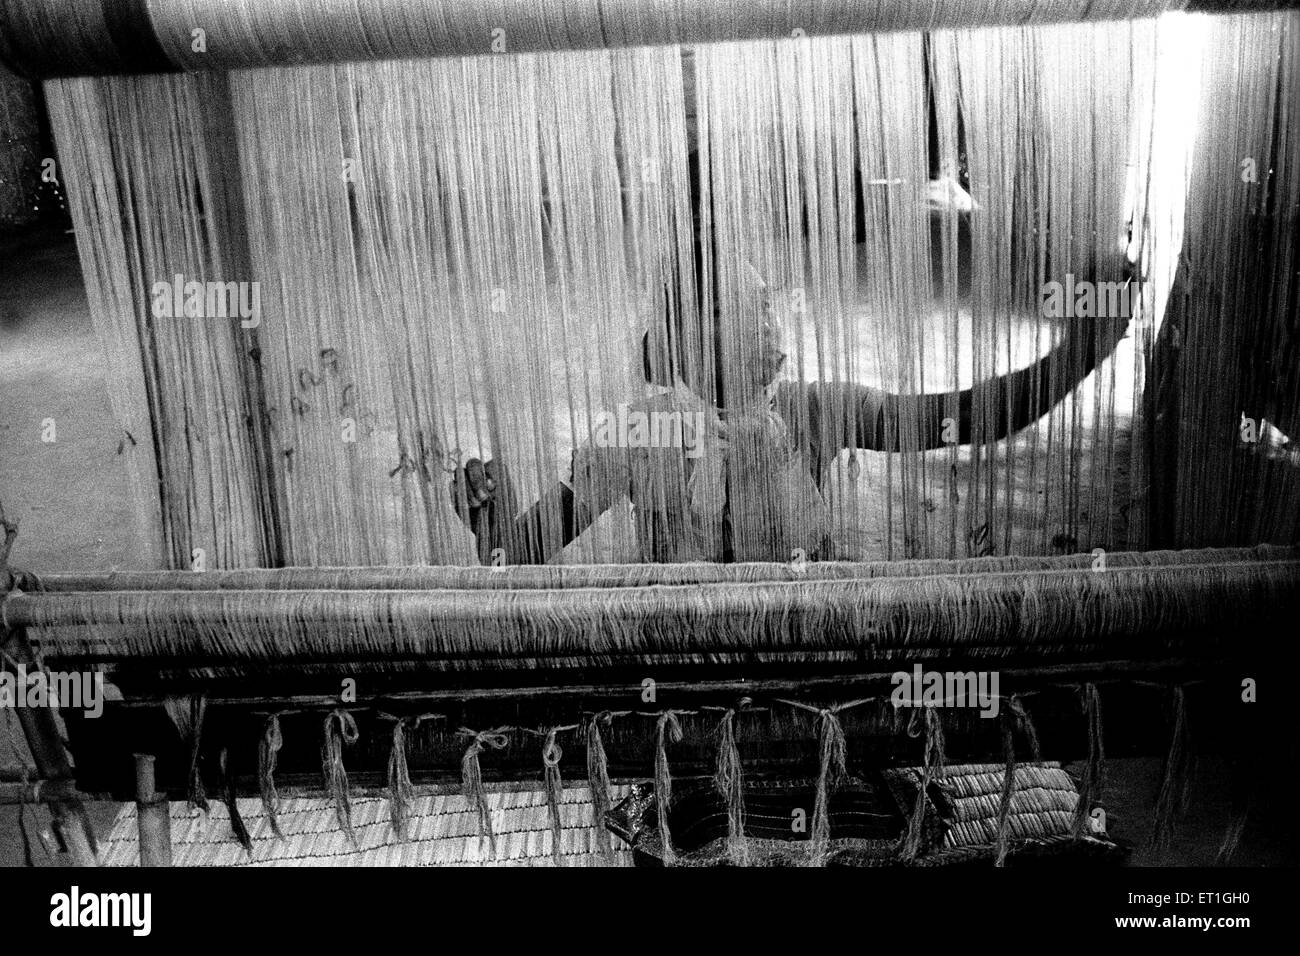 Bodo woman weaving on handloom ; Assam ; India NO MR - Stock Image